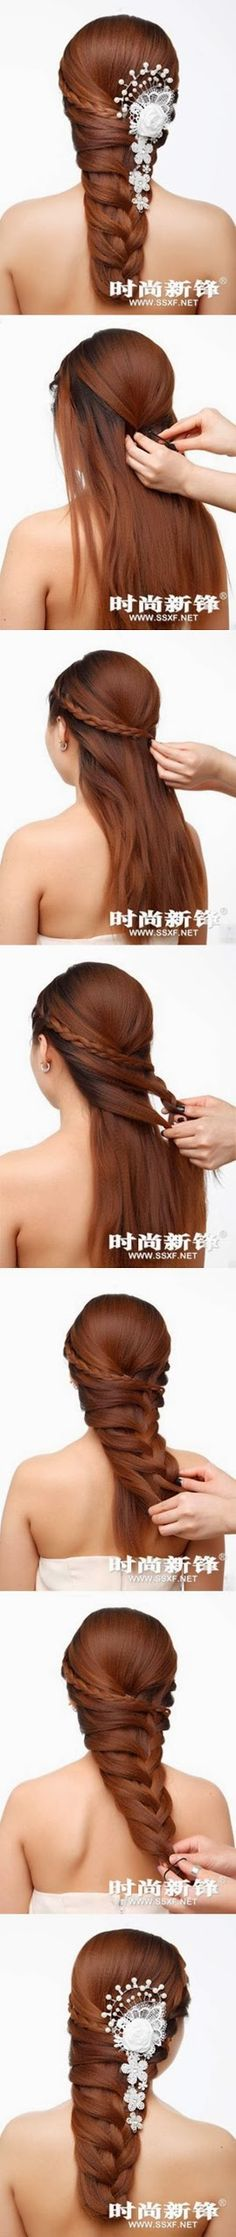 DIY Asymmetrical Braided Hairstyle